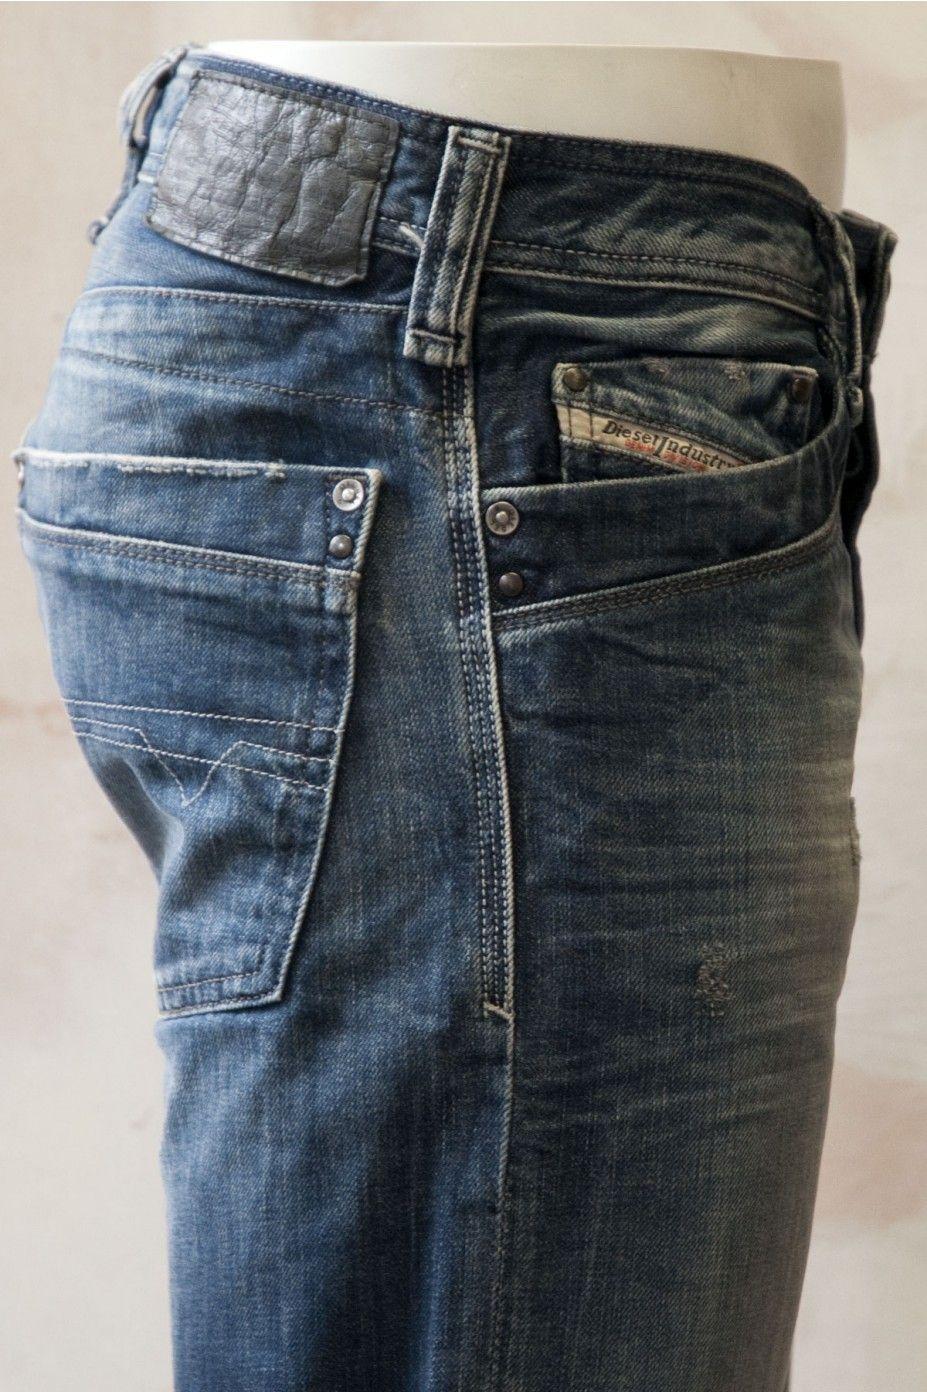 Denim Diesel Men s Jeans Straight Fit  3... look so good on him ... 582406cb88